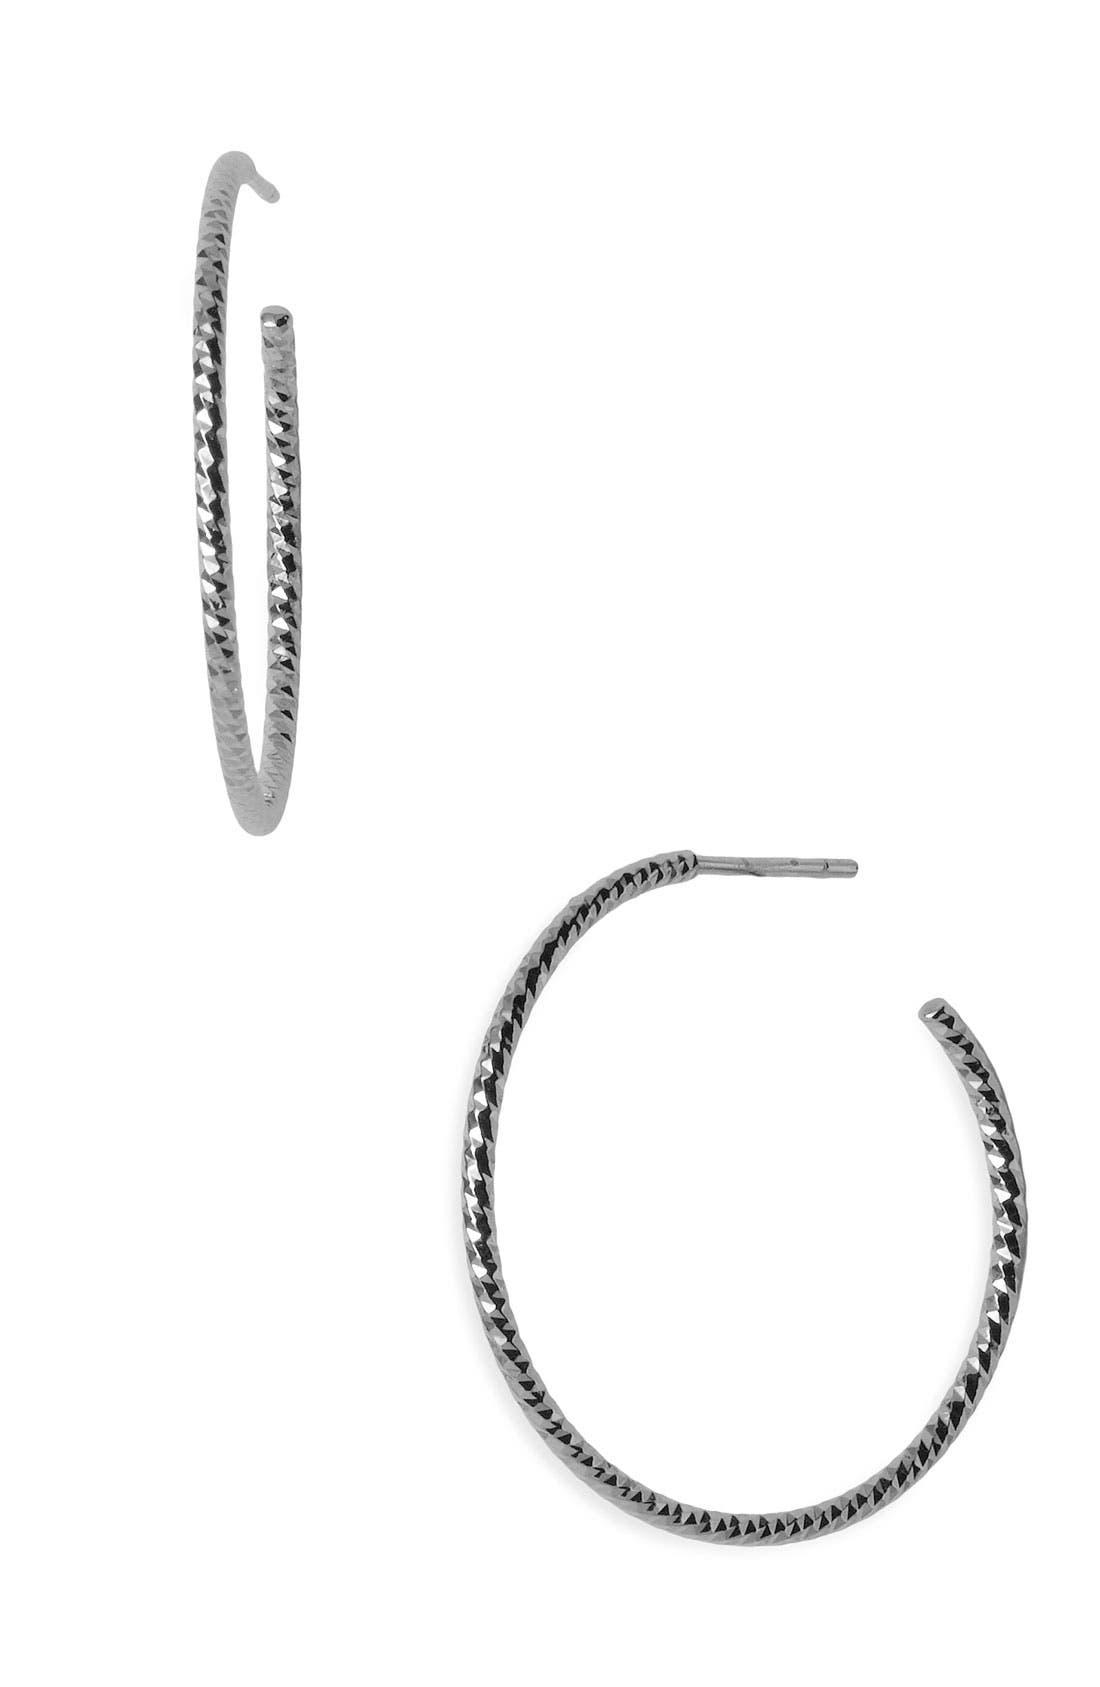 ARGENTO VIVO Textured Hoop Earrings, Main, color, STERLING SILVER